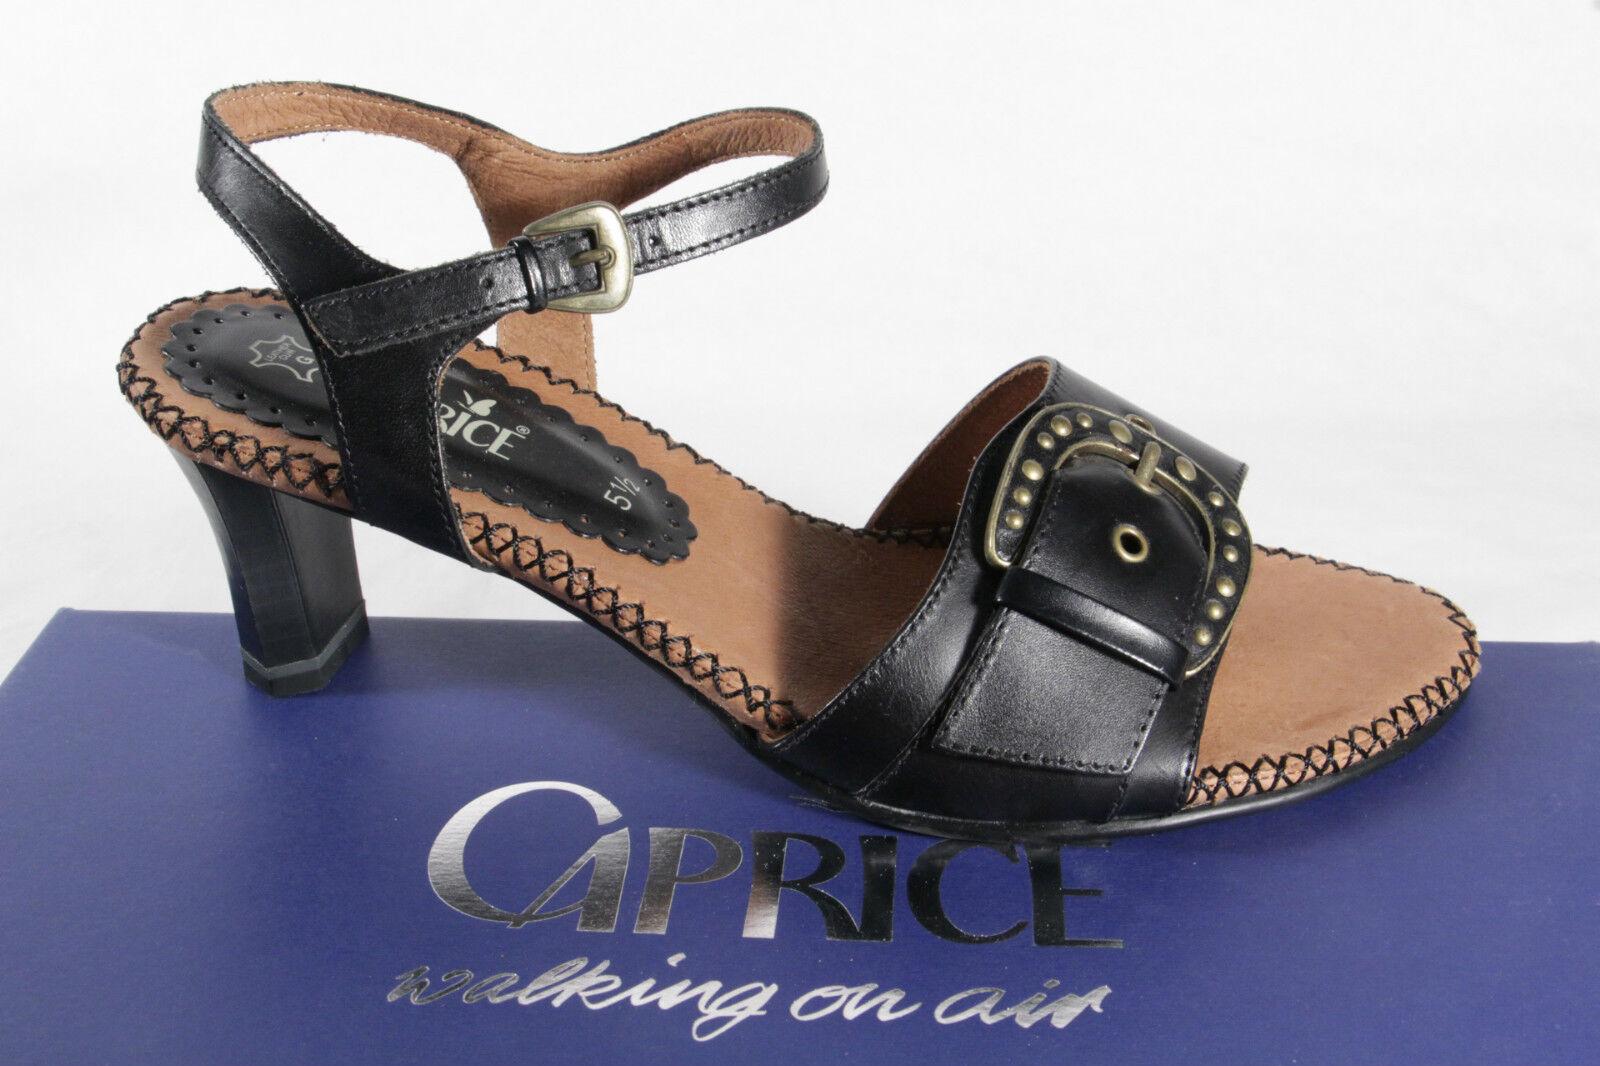 Ladies Caprice Sandals Sneakers Genuine leather New